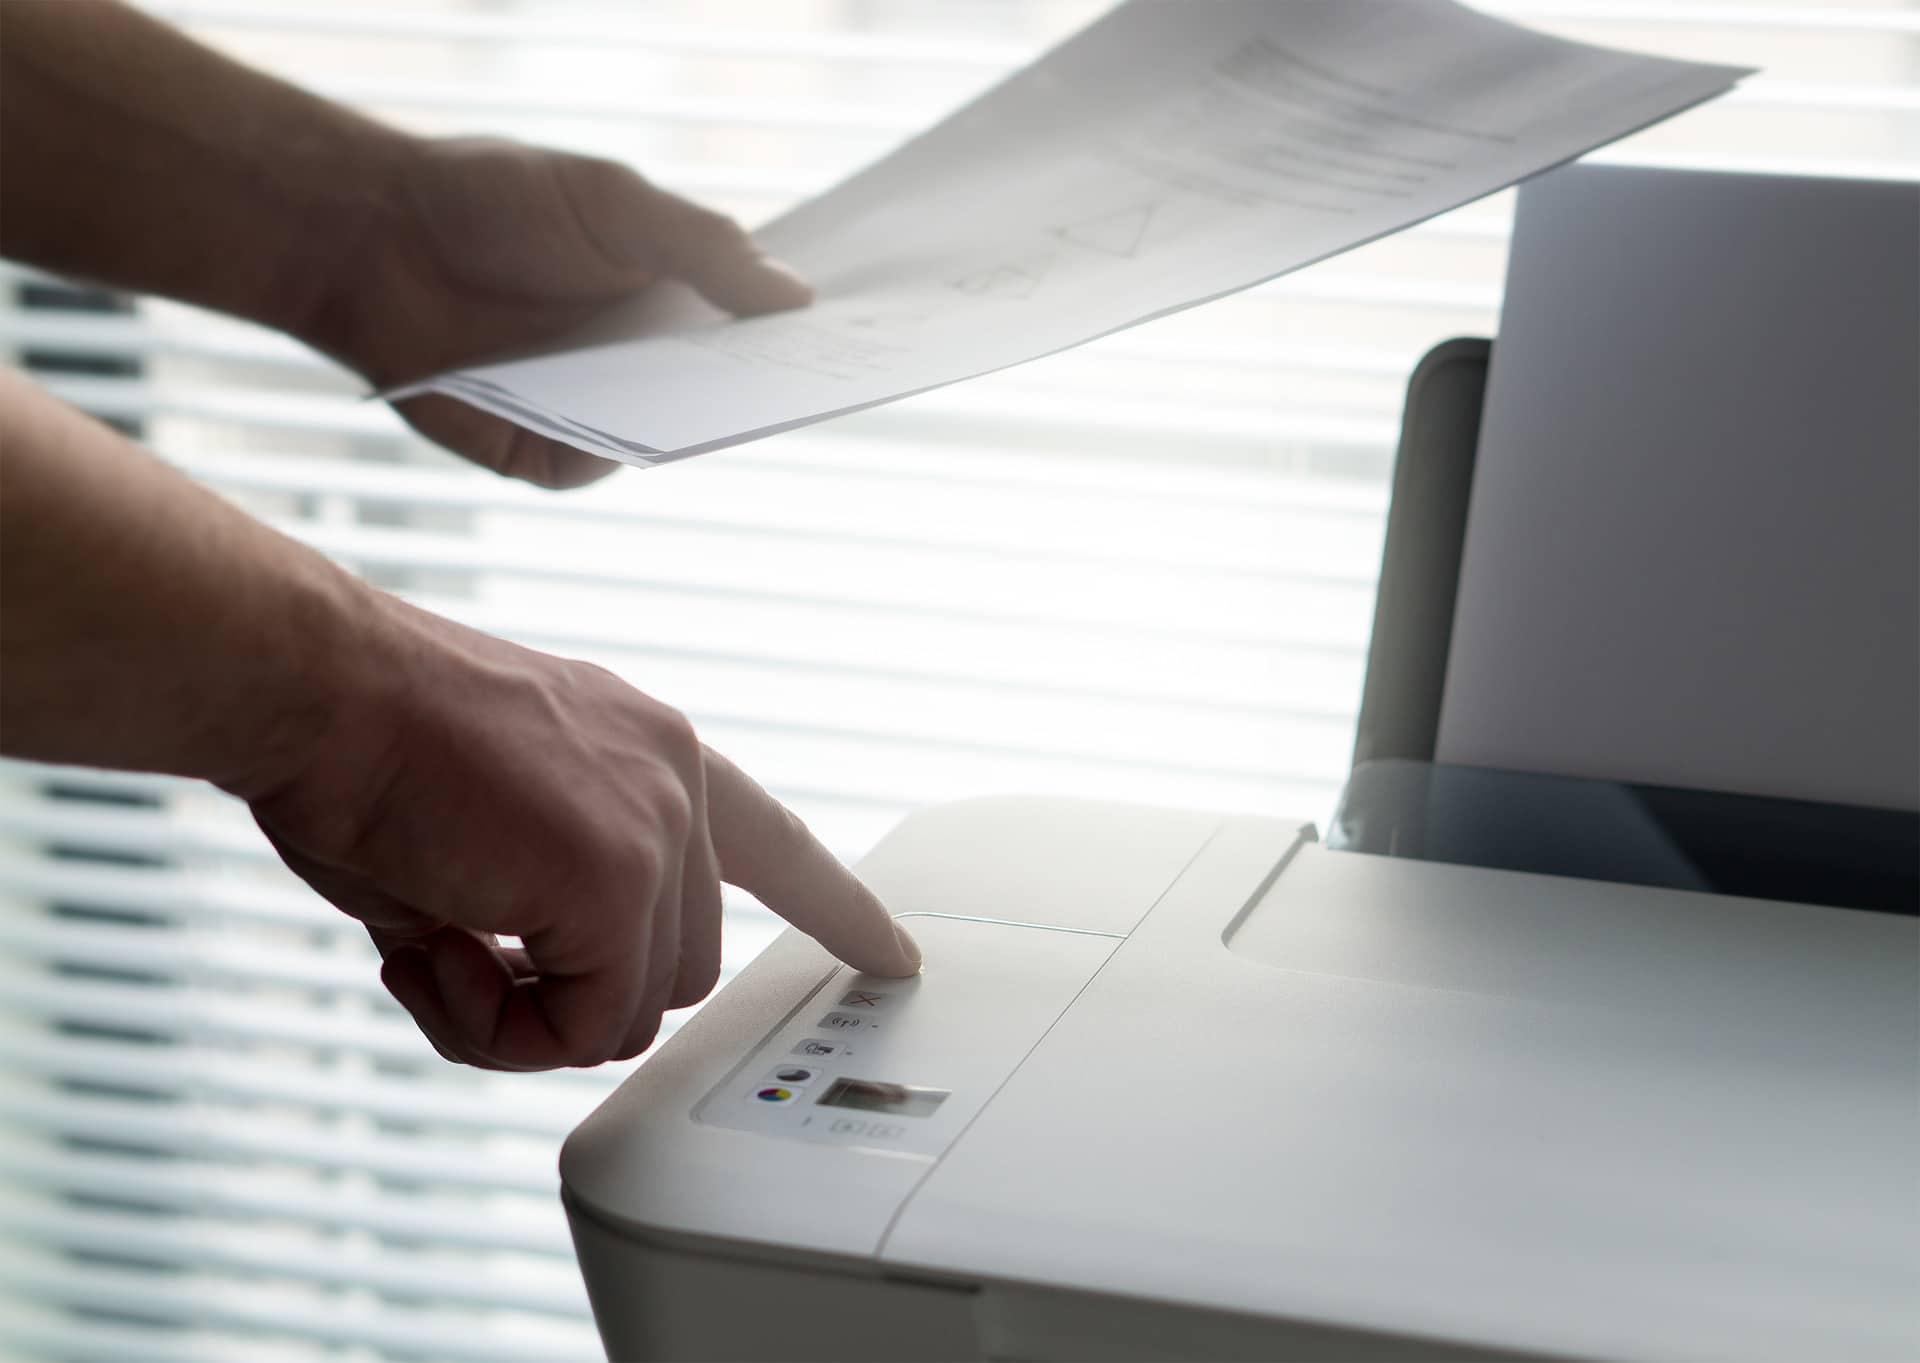 Best Online Fax Service 2018